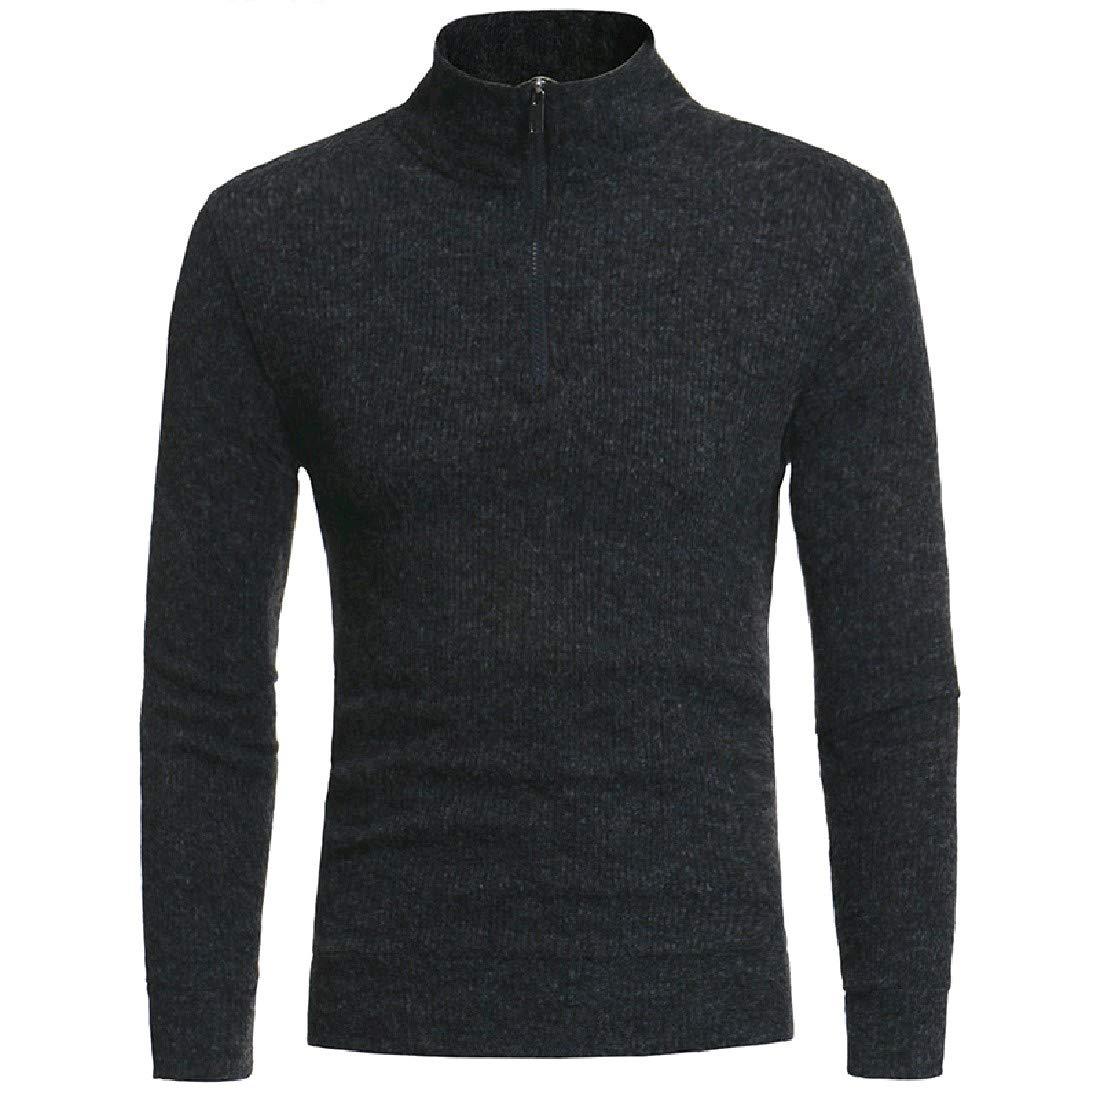 Coolred-Men Oversize Warm Semi-high Collar Knitting Top Tee Sweater